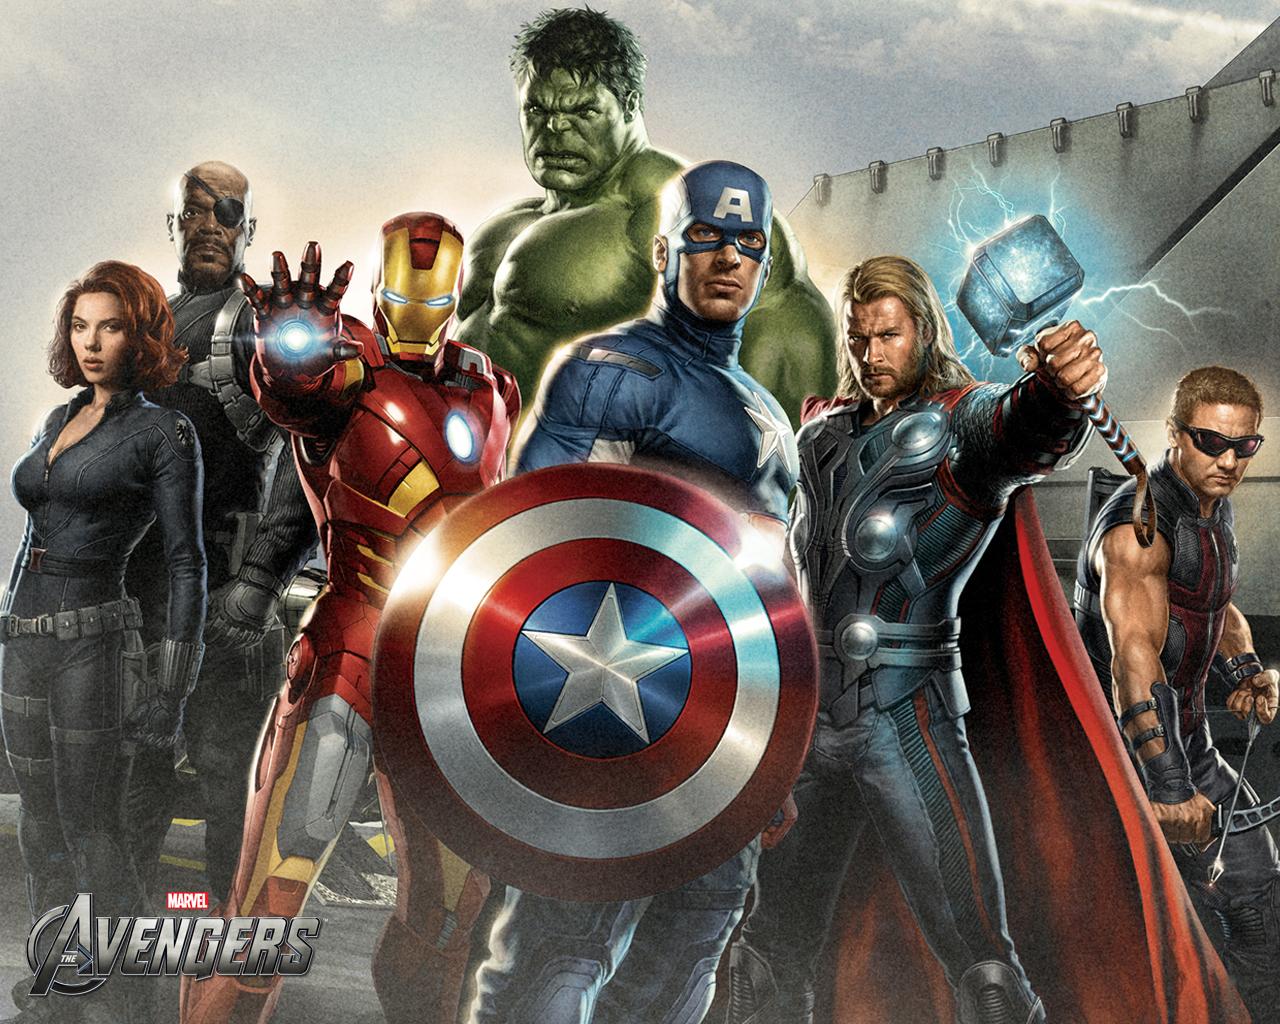 Мстители 4 Picture: Обои: Мстители